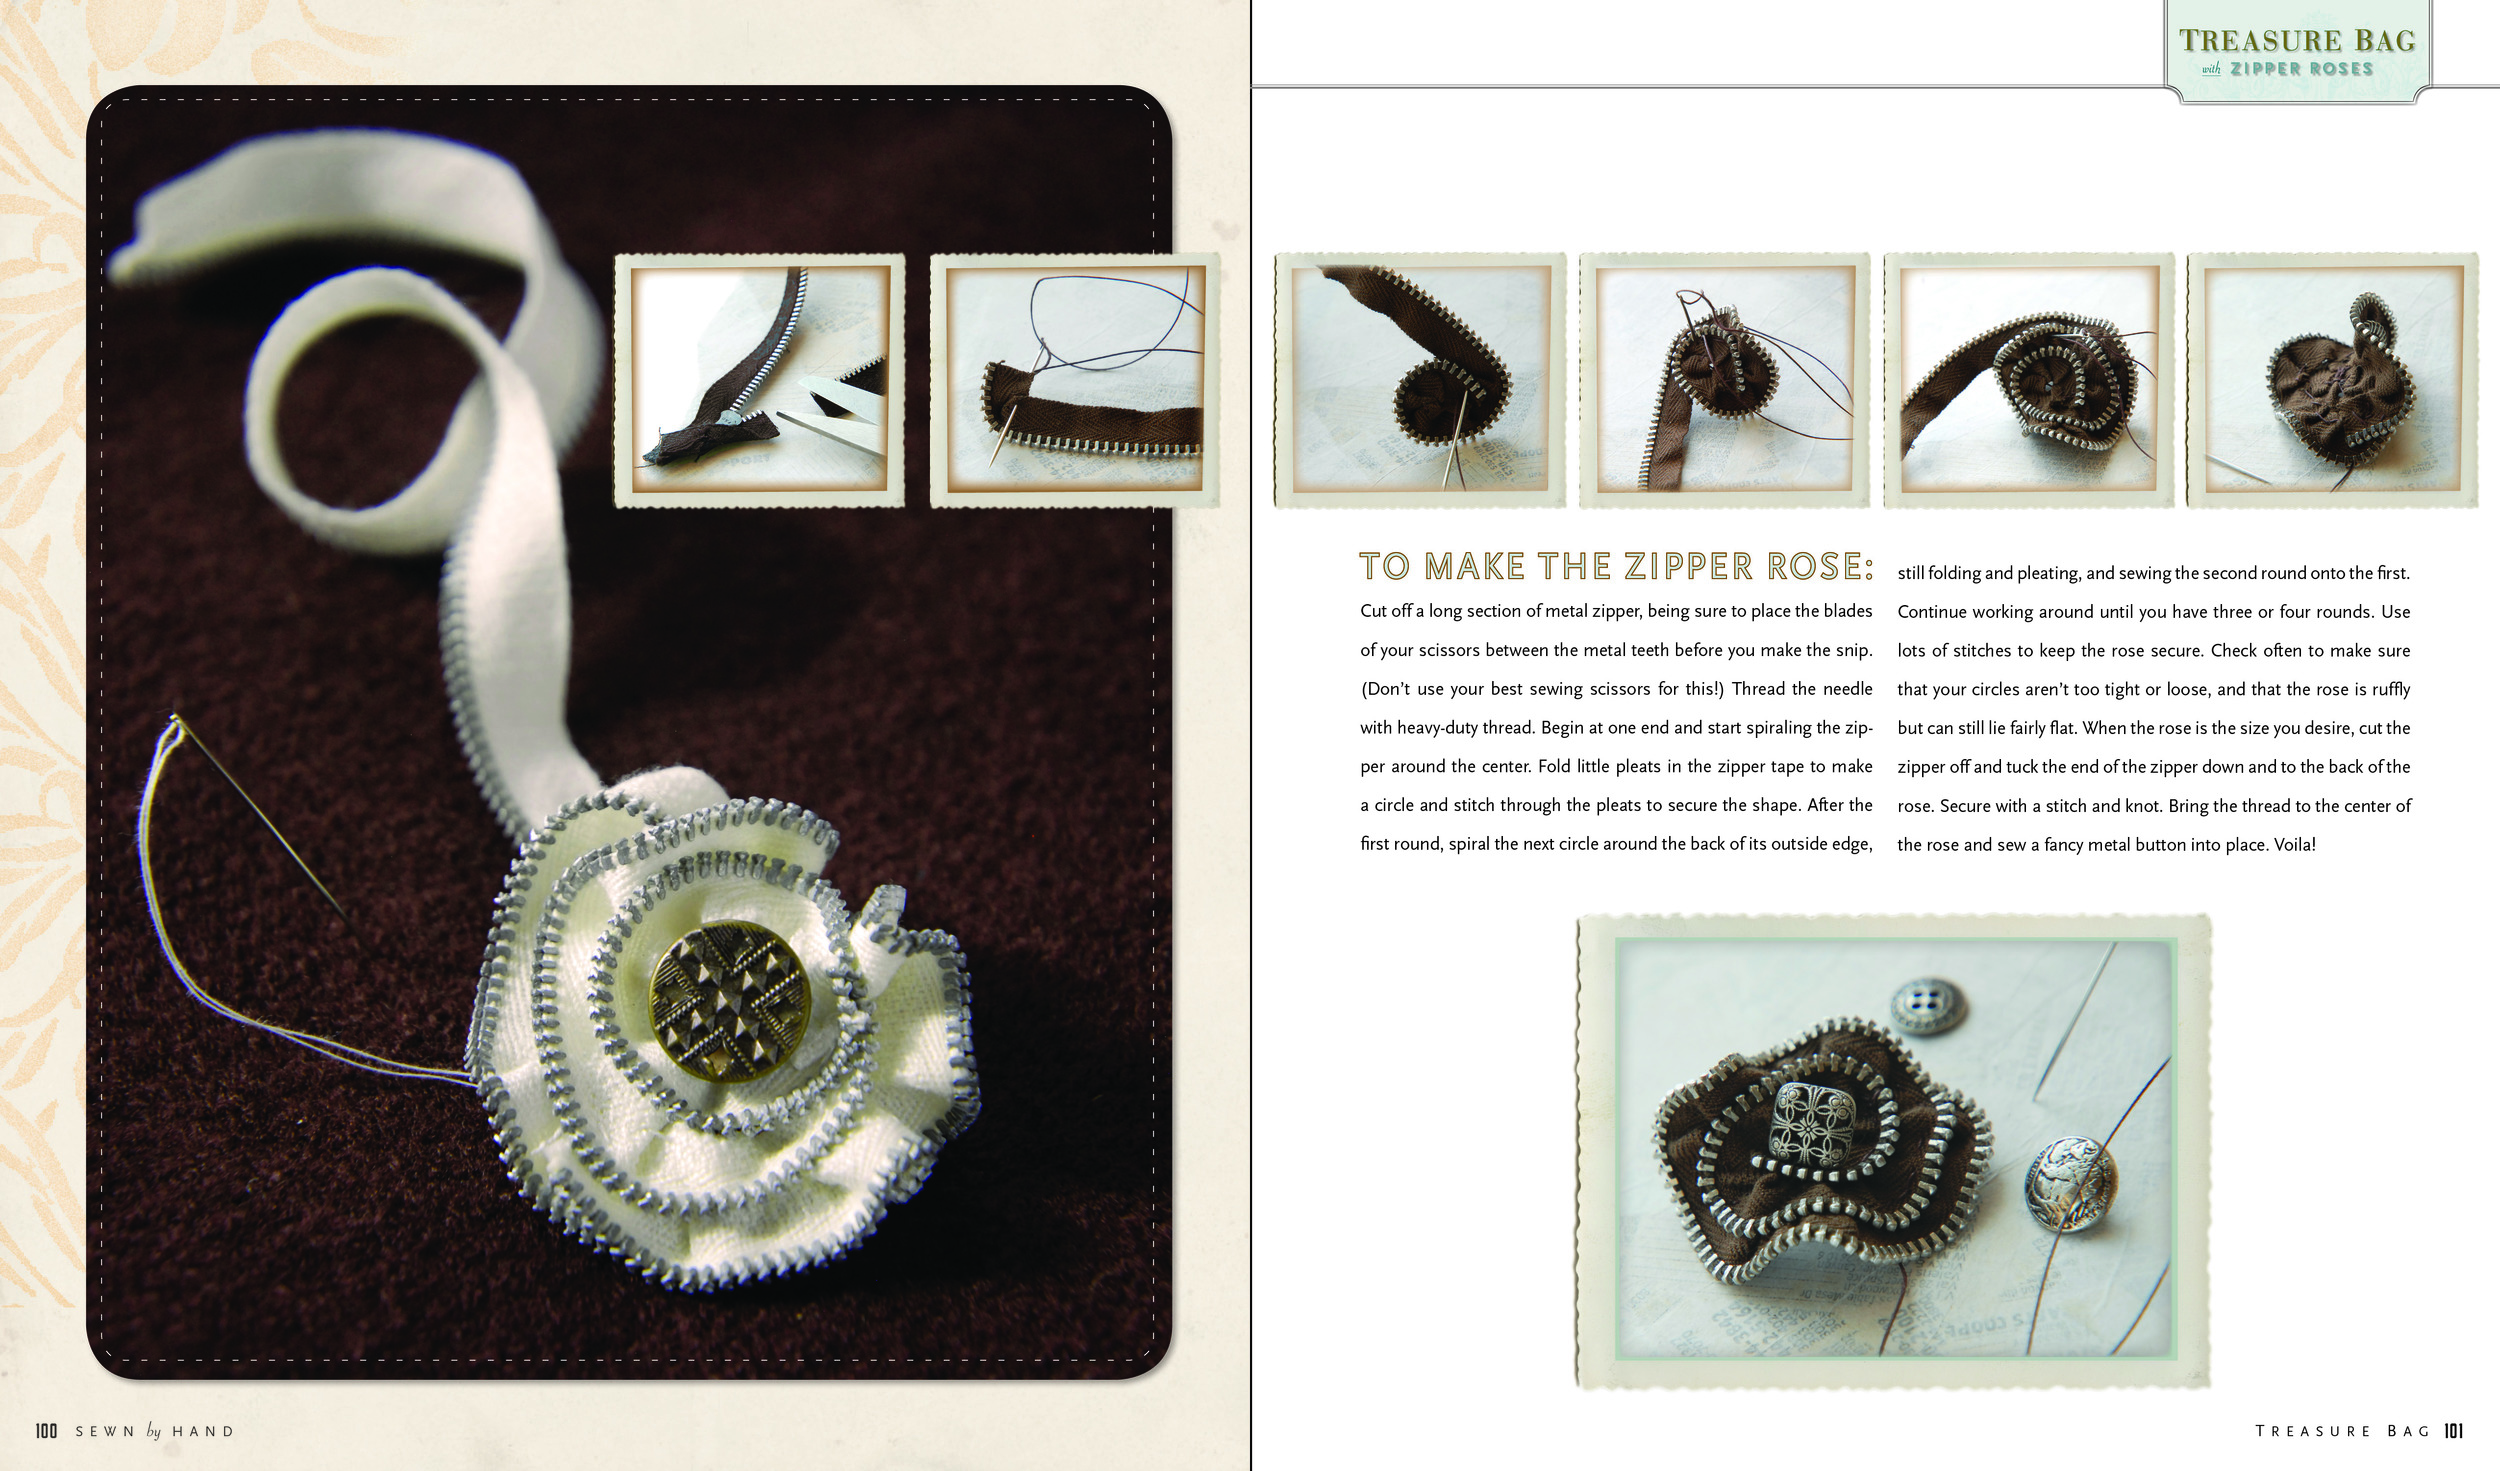 Sewn by Hand zipper rose spread 2.jpg